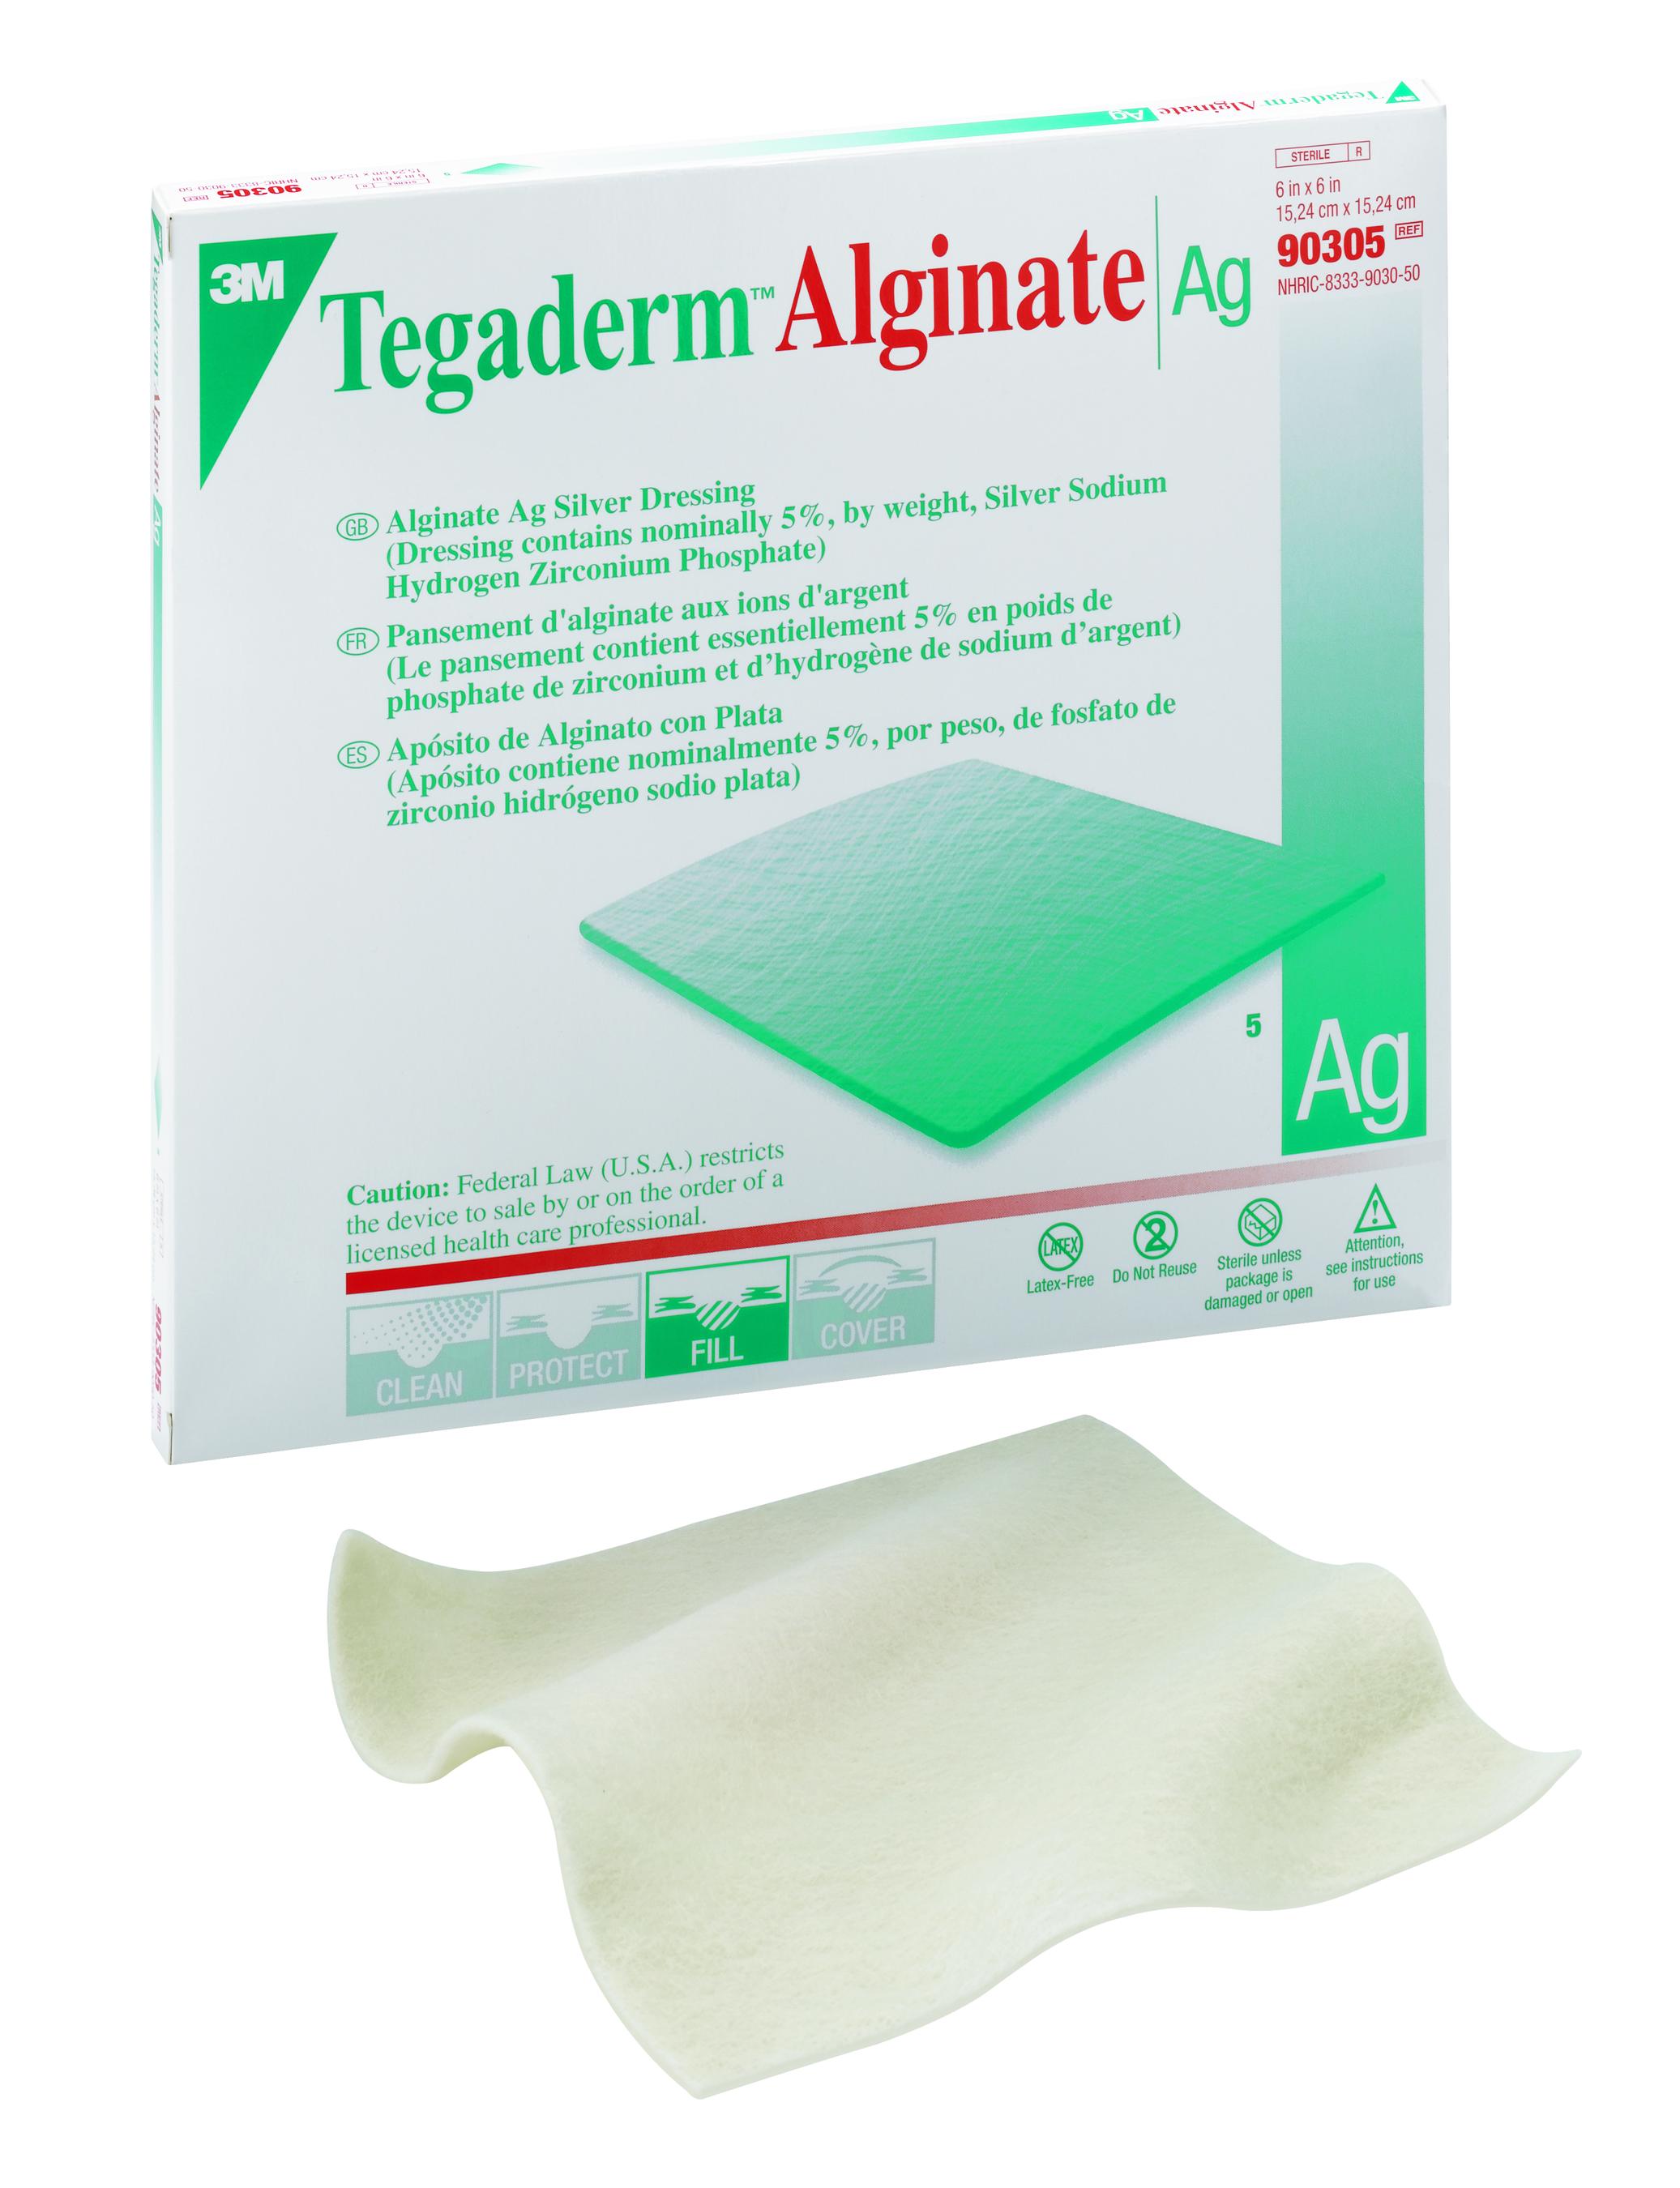 "3M Tegaderm Alginate Ag Silver Dressing, 6 X 6"", 90305, Box of 5"